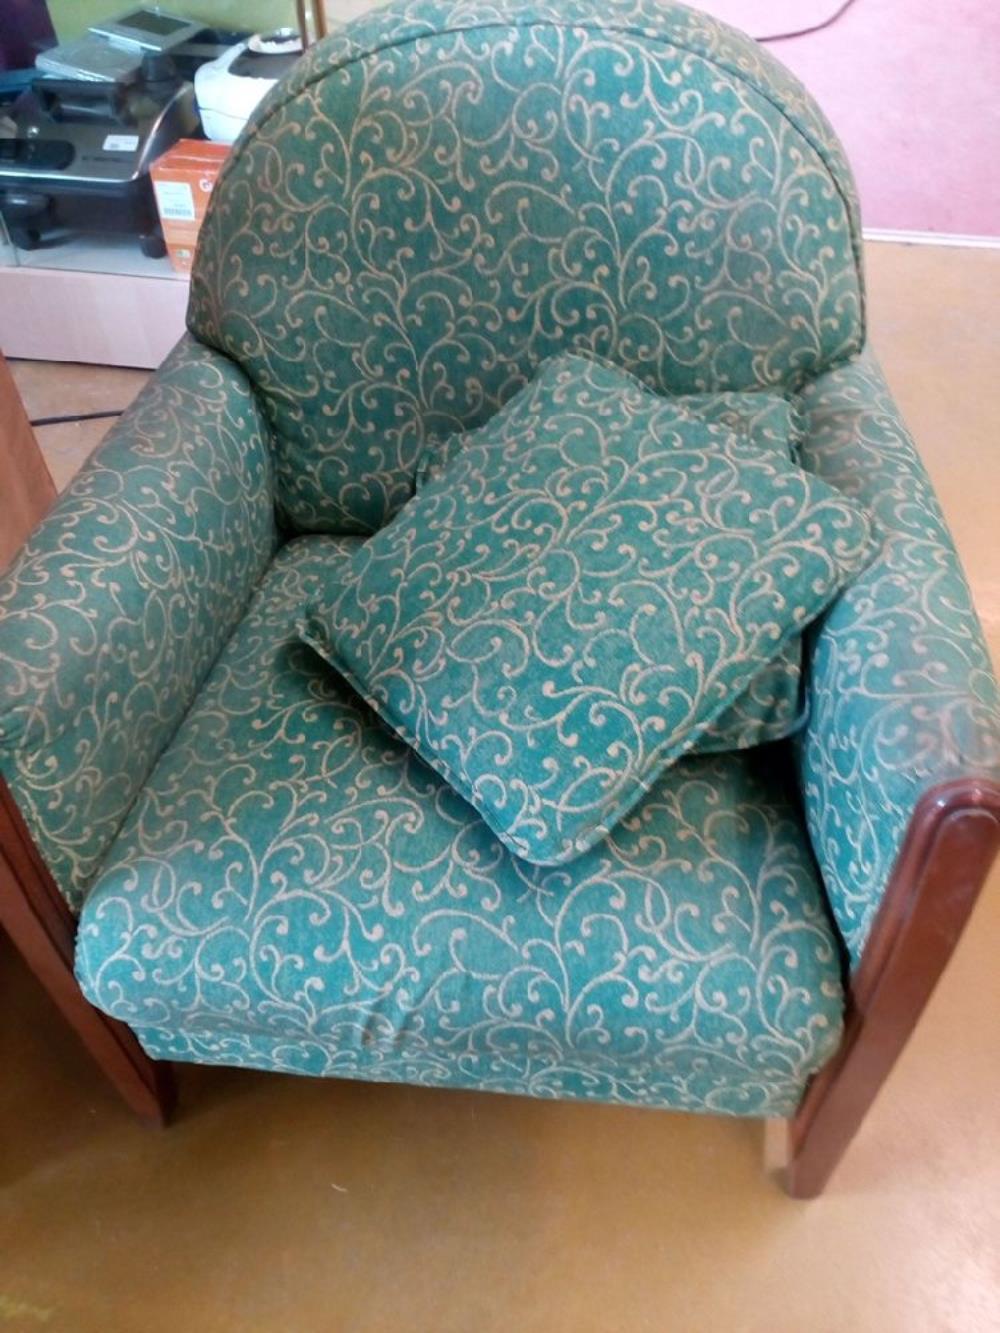 fauteuil tissus vert occasion le troc. Black Bedroom Furniture Sets. Home Design Ideas